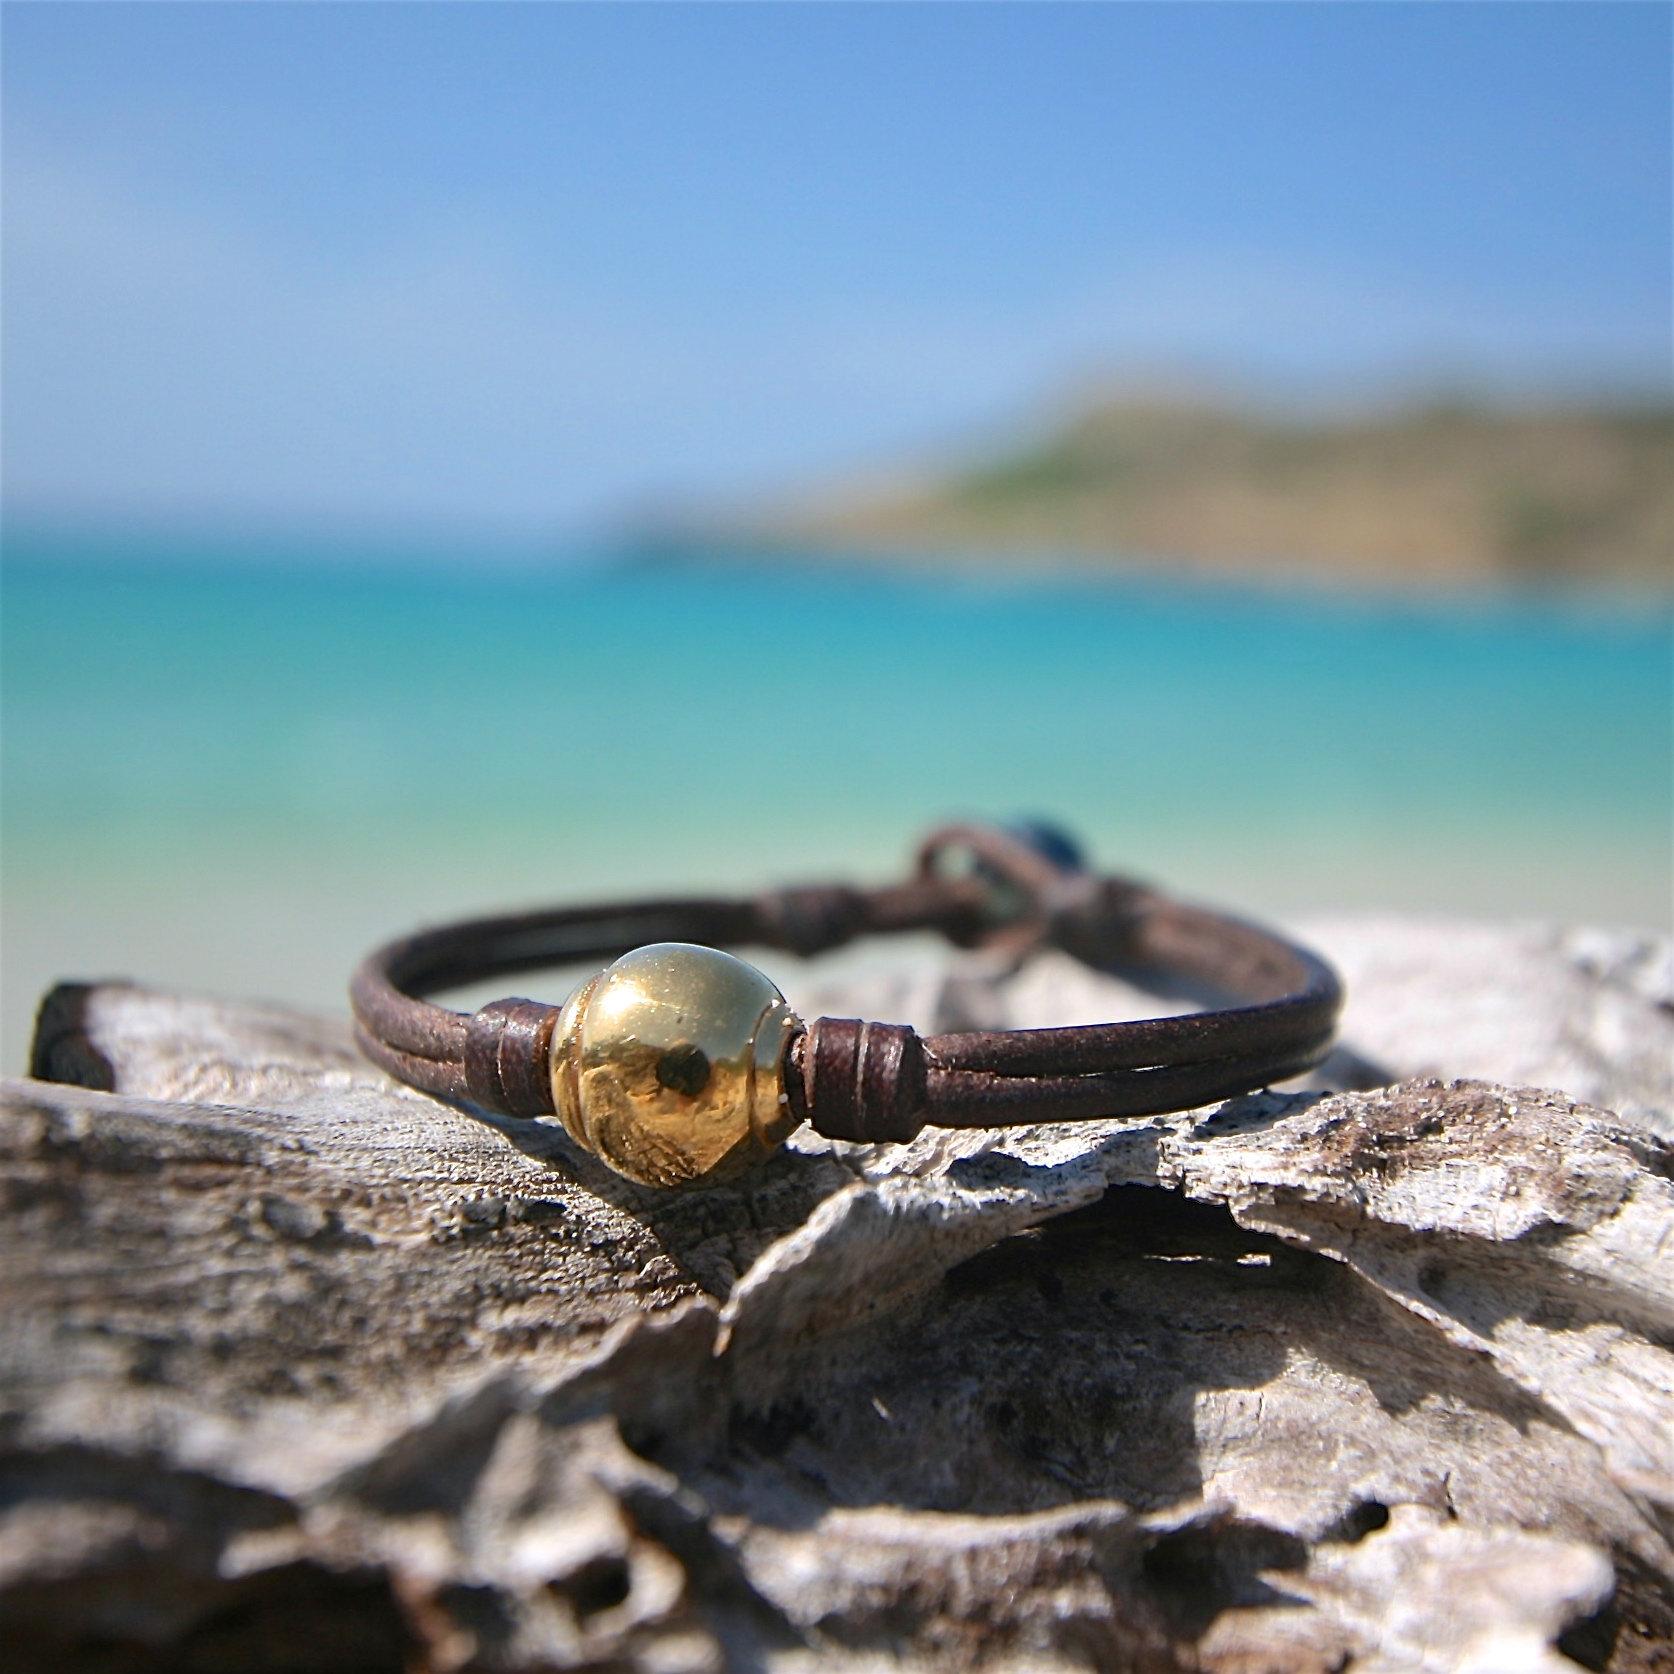 18k gold beads Tahitian pearl replica strung on leather with 1 Tahitian pearl clasp, Gold and leather, St Barth, beach jewelry, boho chic